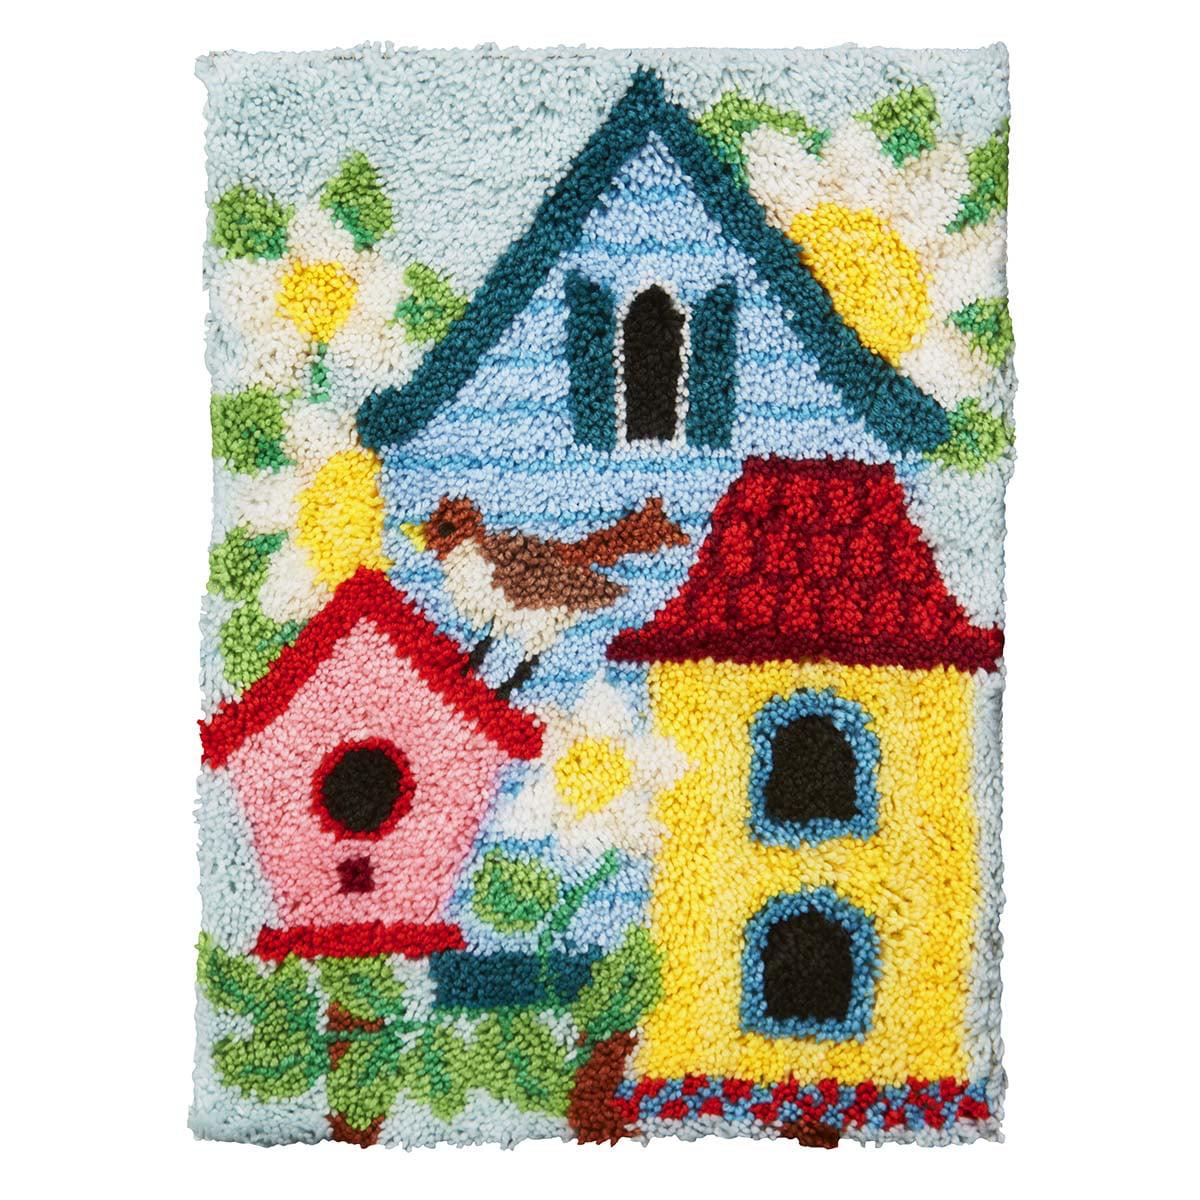 Herrschners® Birdhous Garden Latch Hook Kit